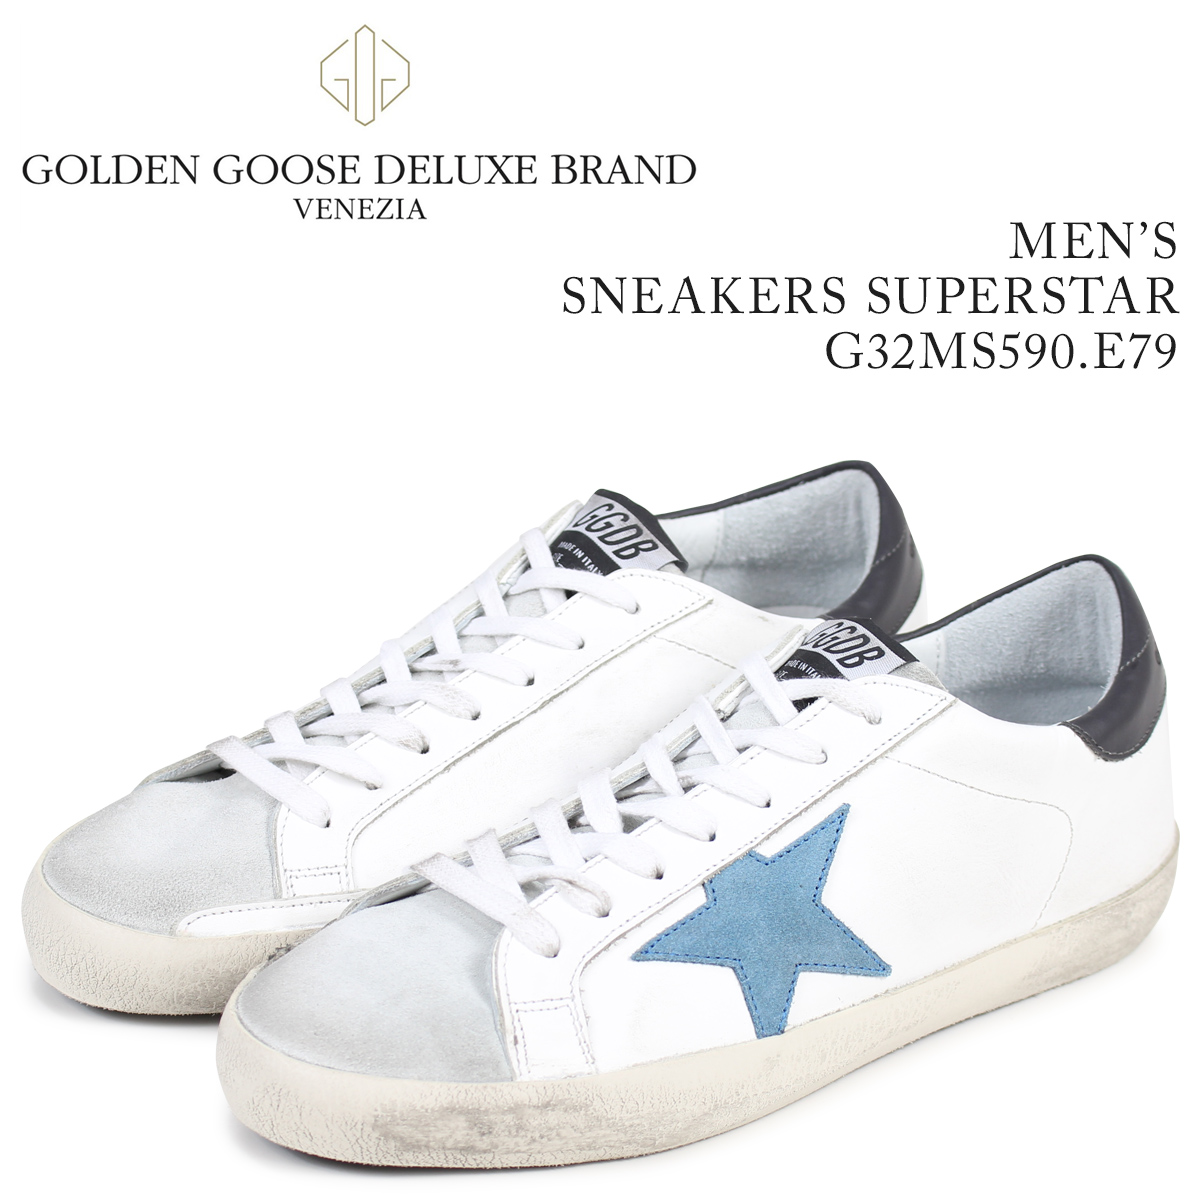 Golden Goose ゴールデングース スニーカー メンズ スーパースター SNEAKERS SUPERSTAR ホワイト G32MS590 E79 【決算セール 返品不可】